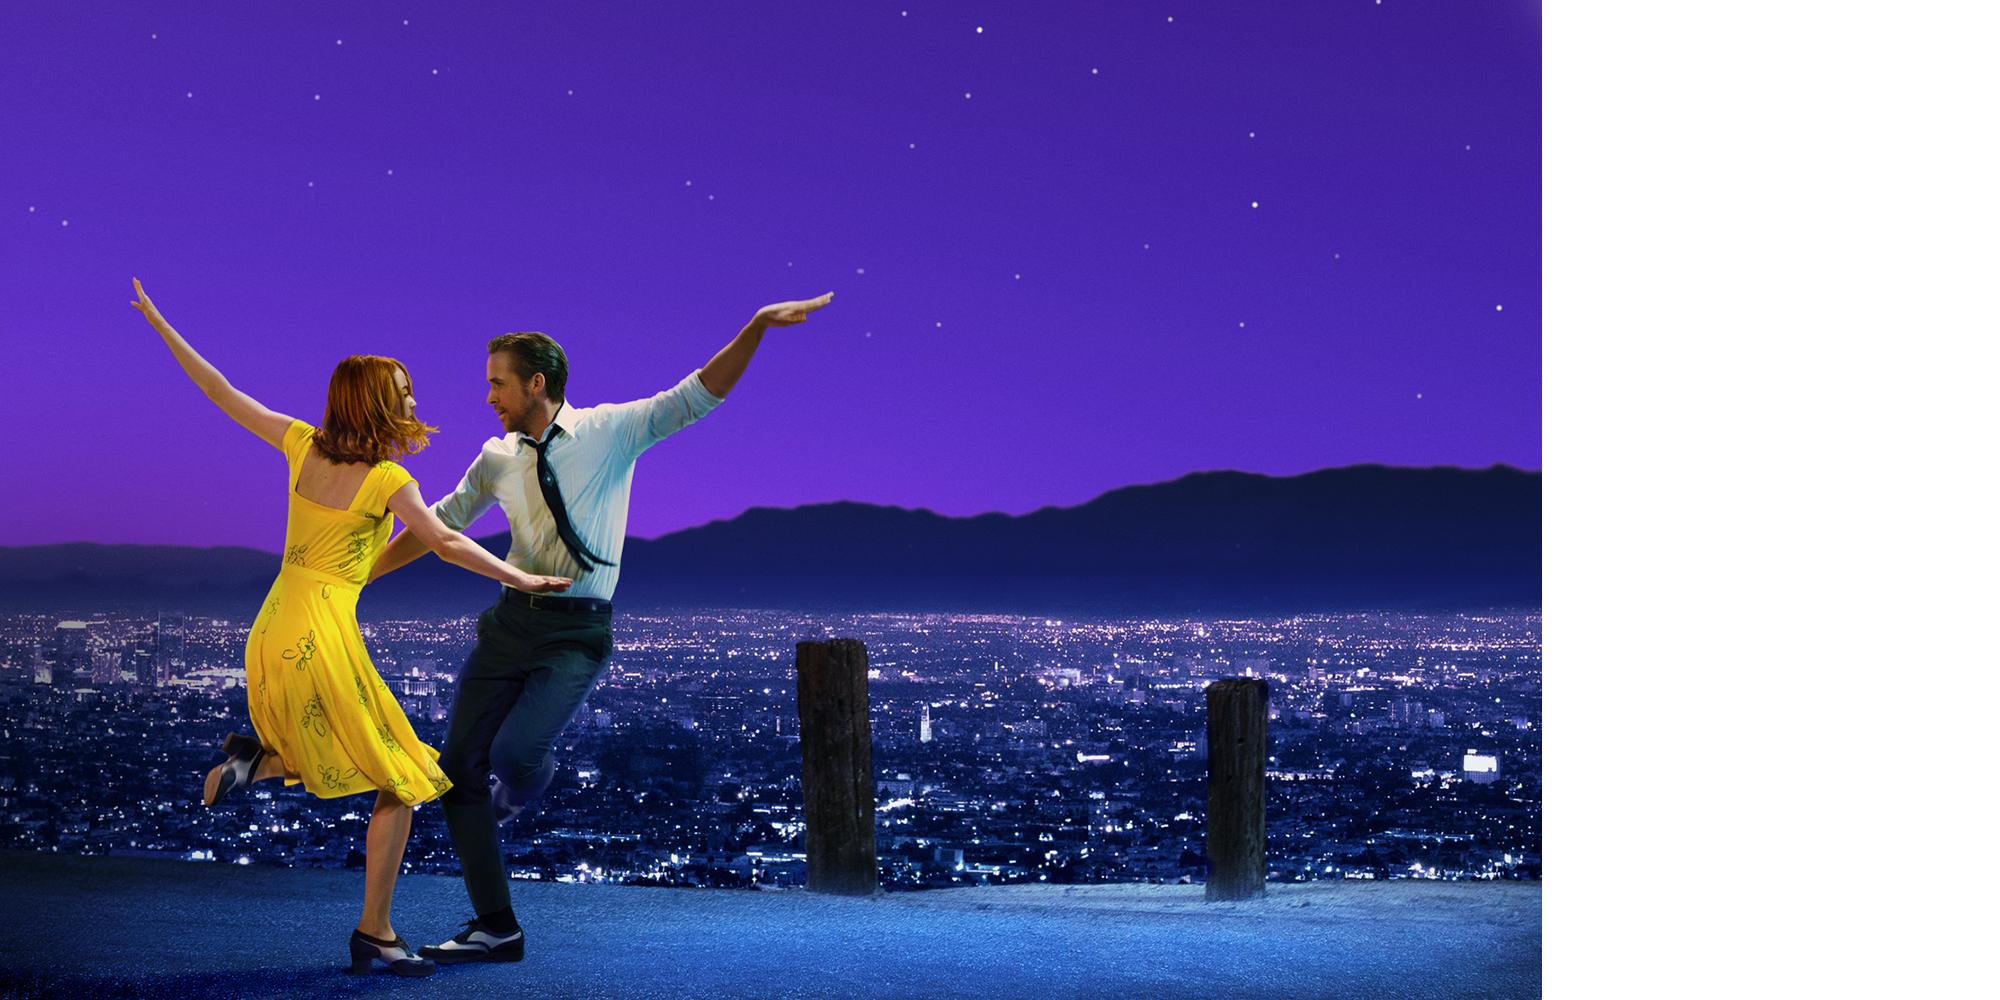 La La Land Wallpapers Lala Land City Of Stars 1075473 Hd